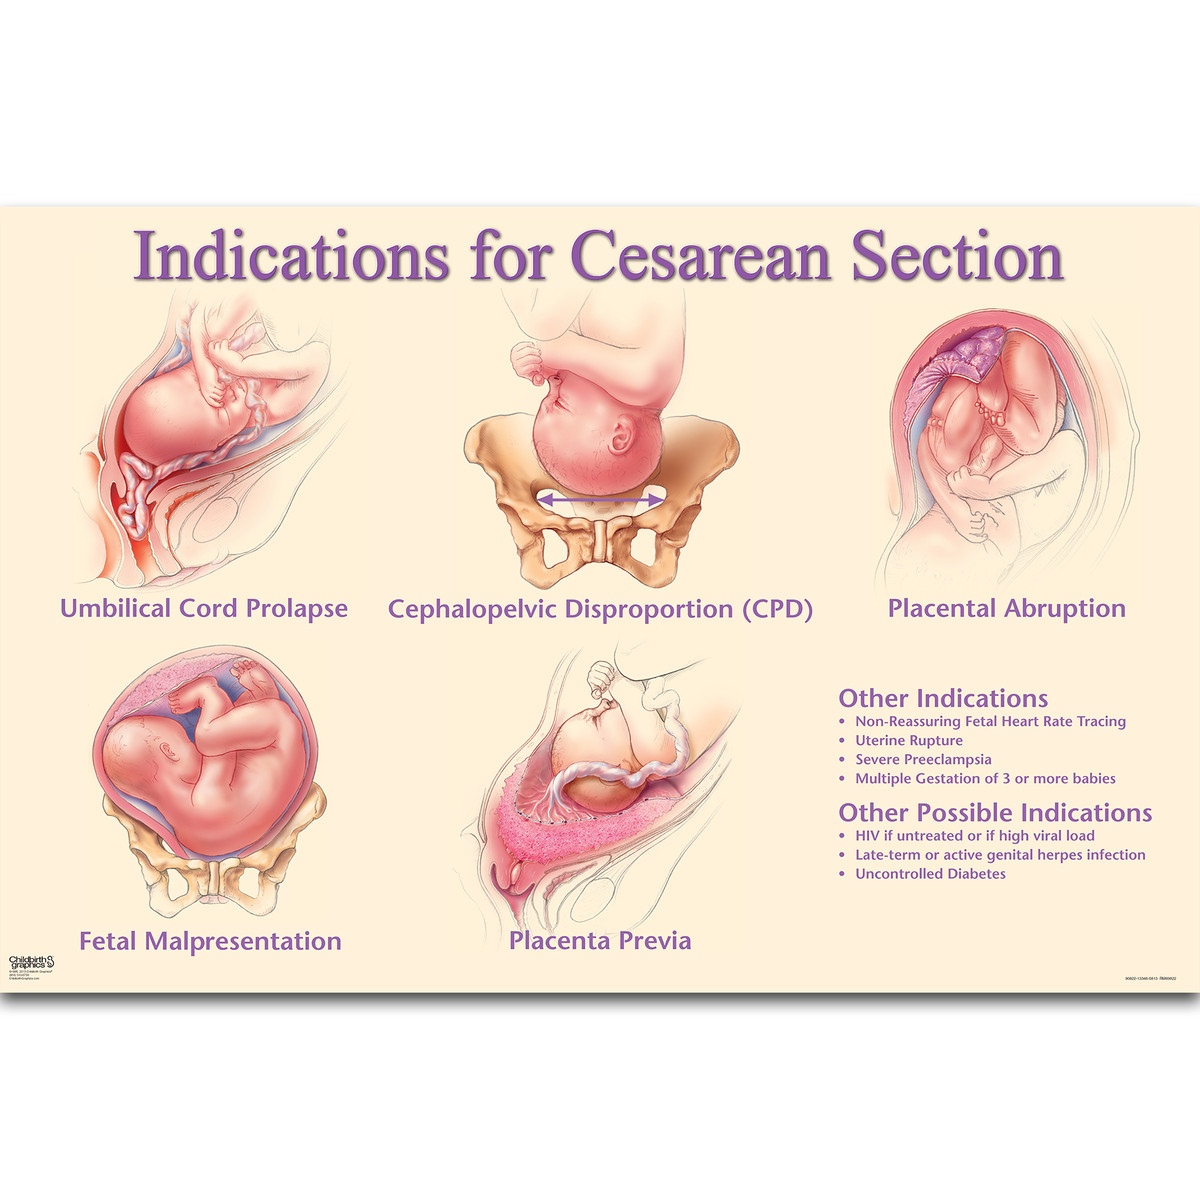 a cesarean delivery Appendix a: codes to identify deliveries 59622 cesarean delivery, including postpartum care drg codes codes description 370-375 c-section or vaginal delivery.